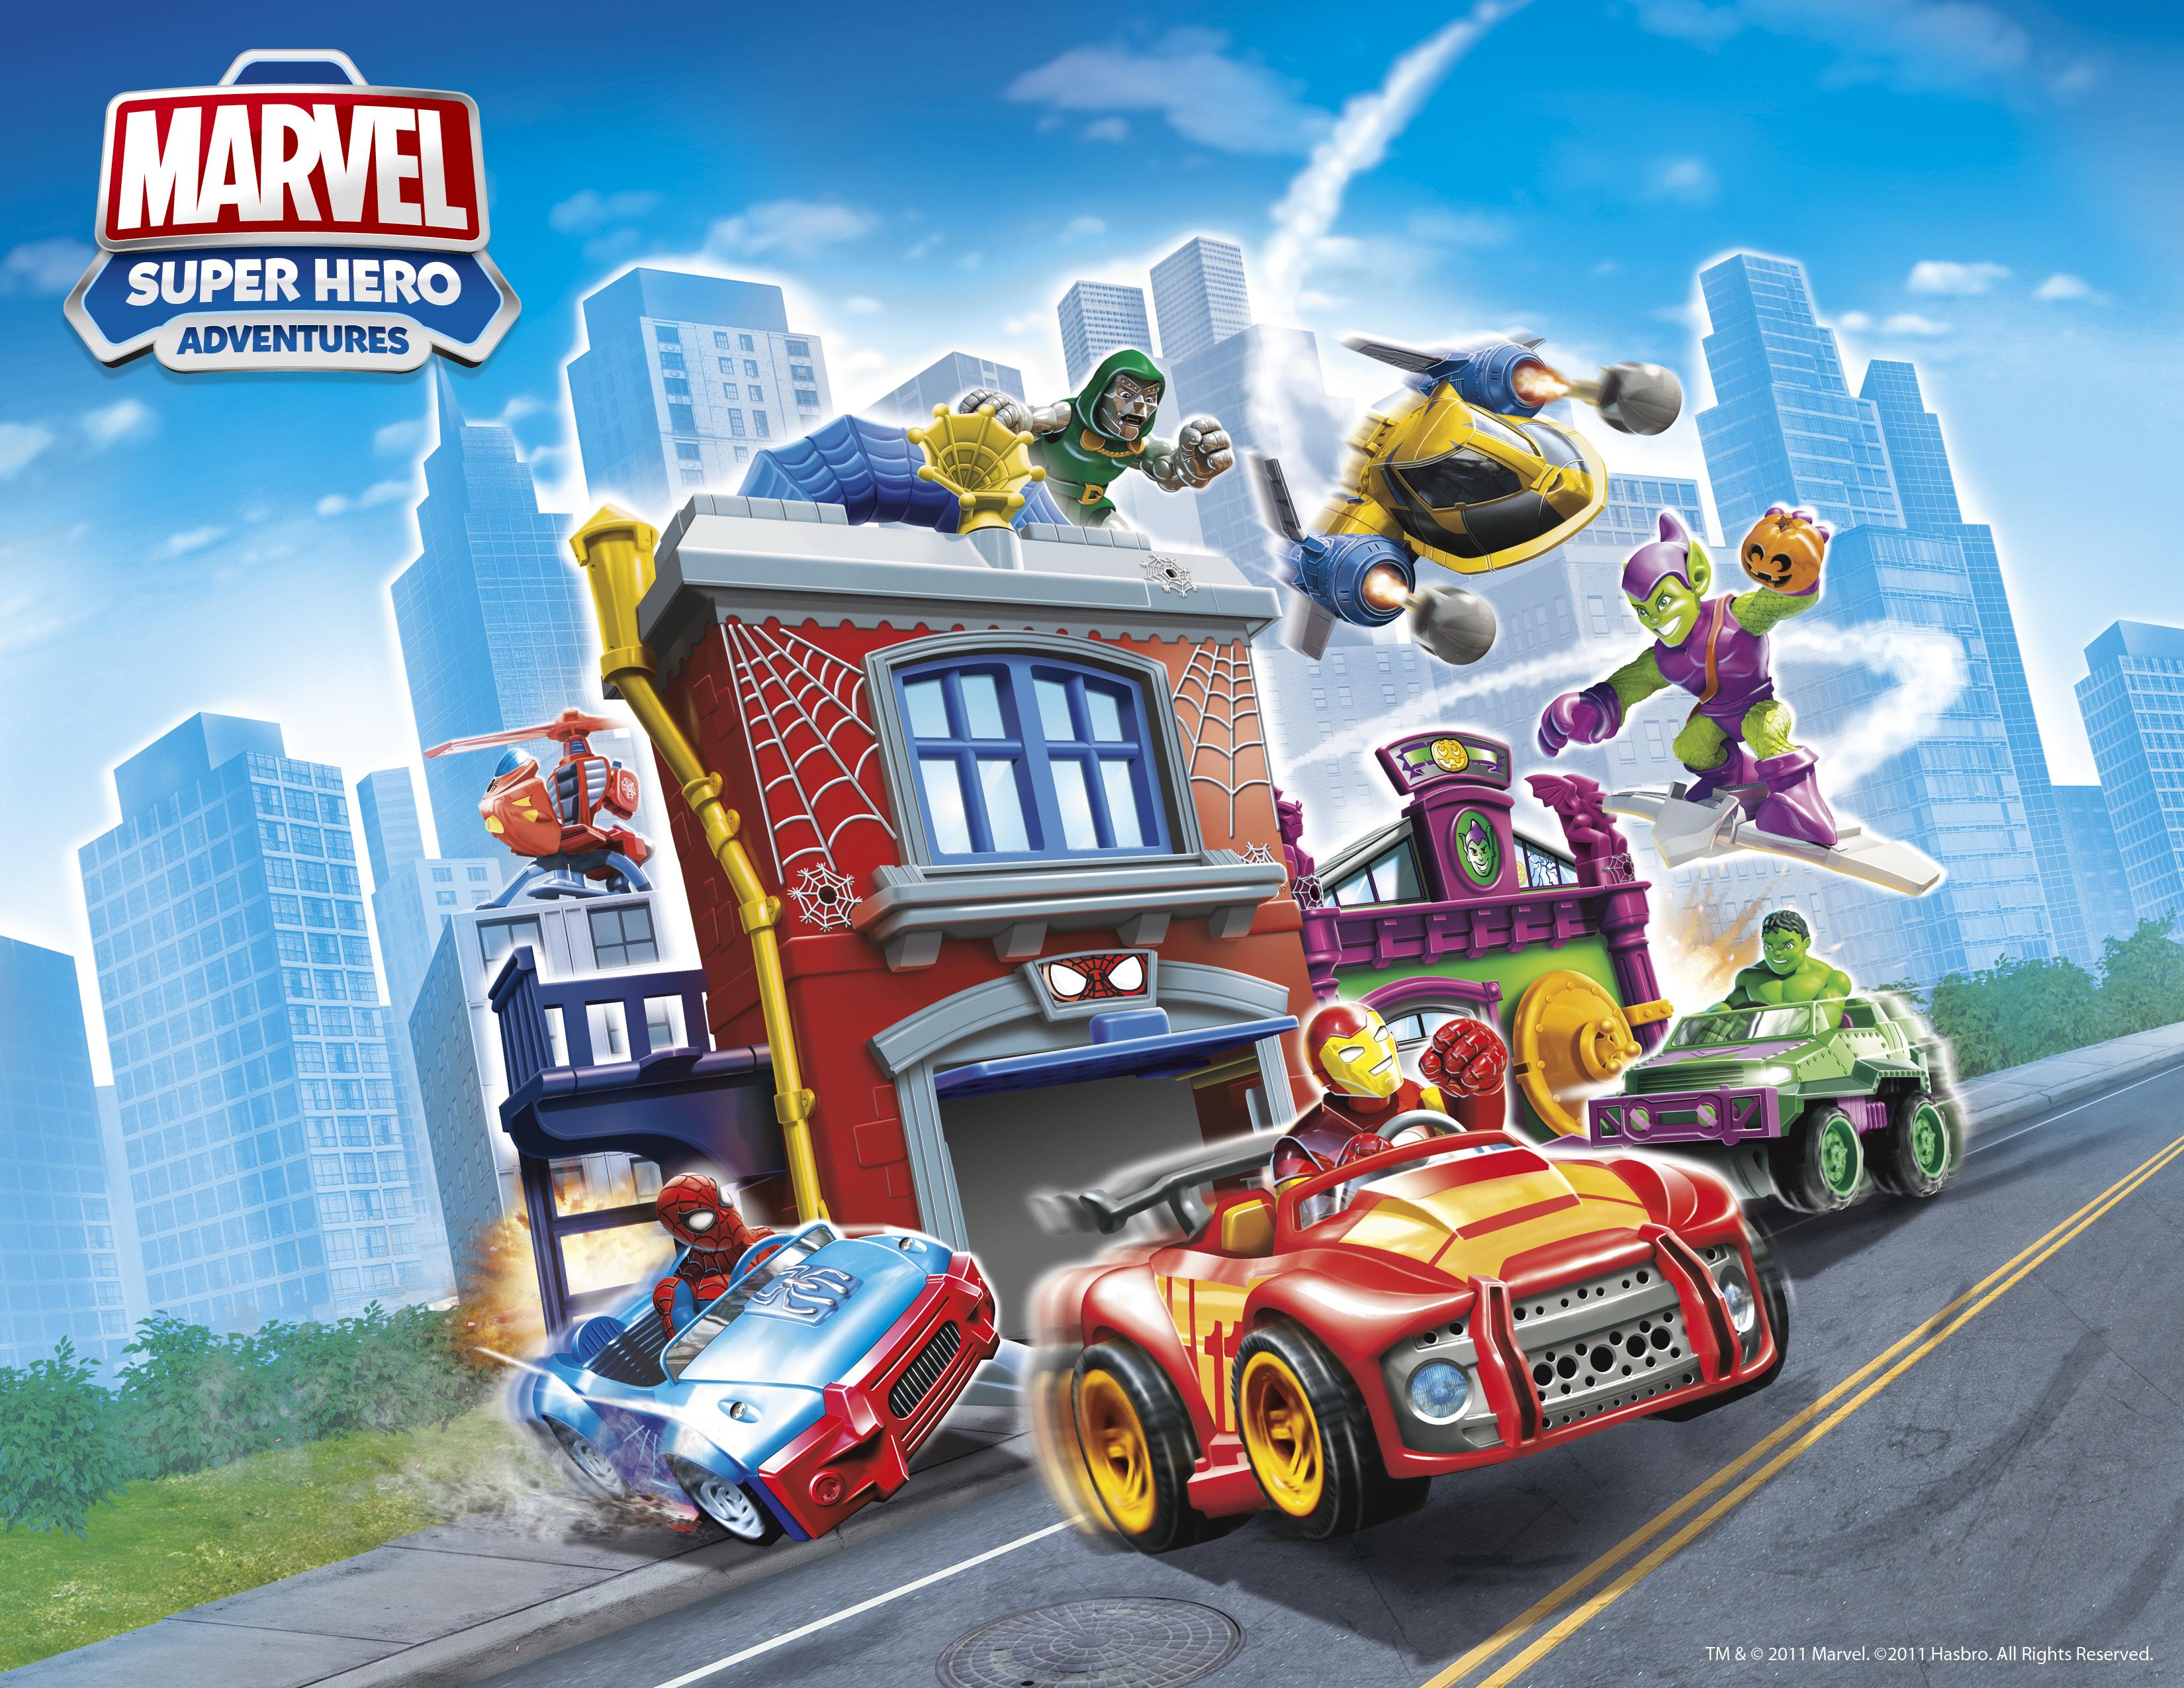 Free printable coloring pages rescue bots - Playskool Heroes Marvel Super Hero Adventures Download